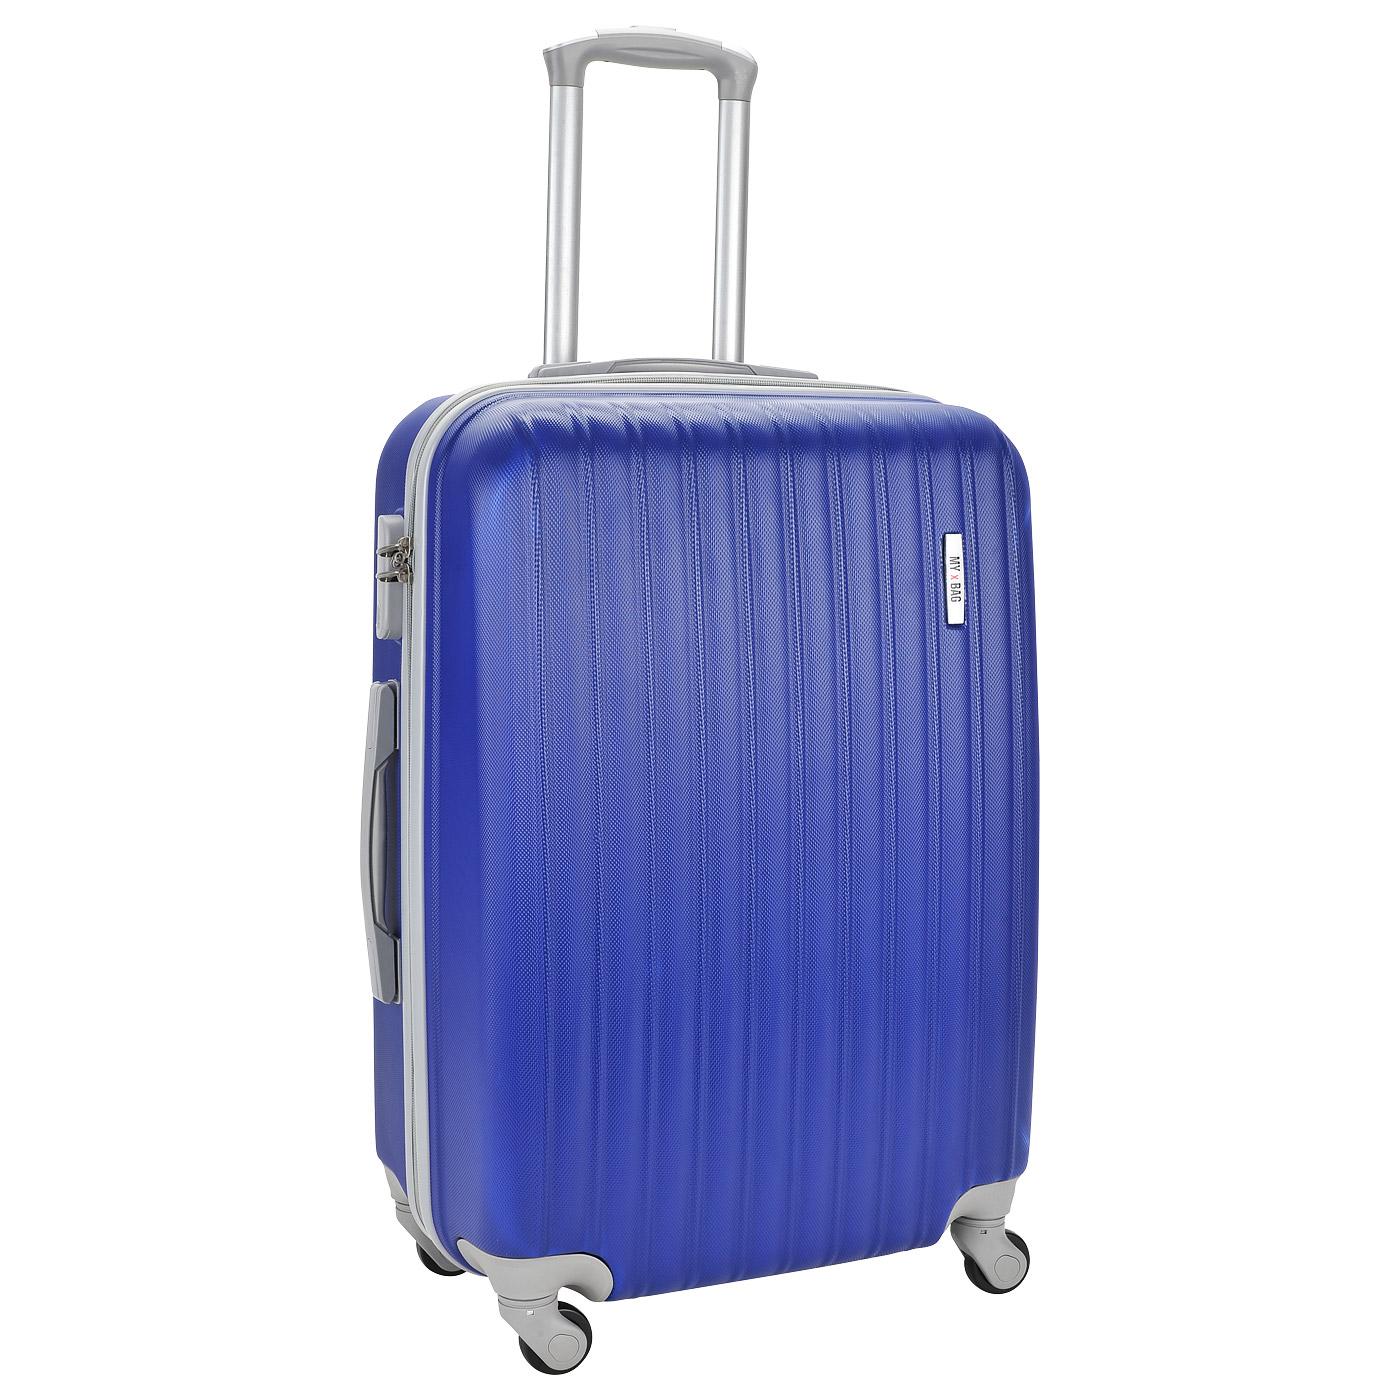 Чемодан на колесах MyxBag MXB-light blue-M-i - 2000557764675 синий ... 152cb560e7d